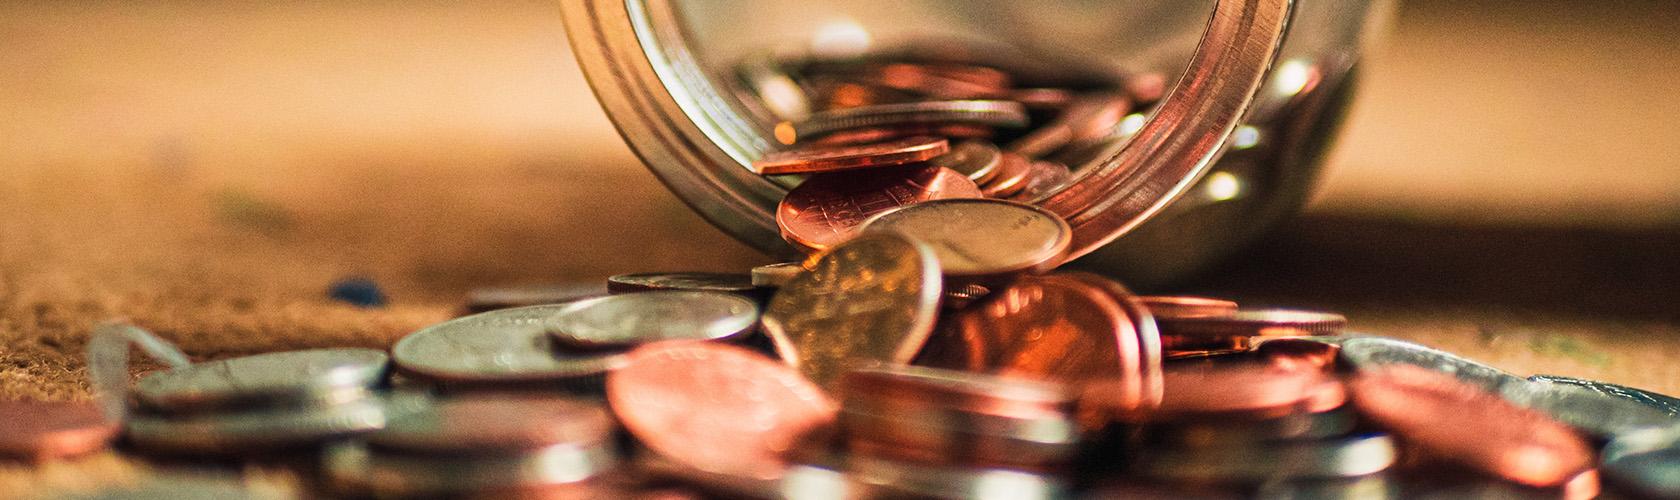 Valuta en geld in Dubai